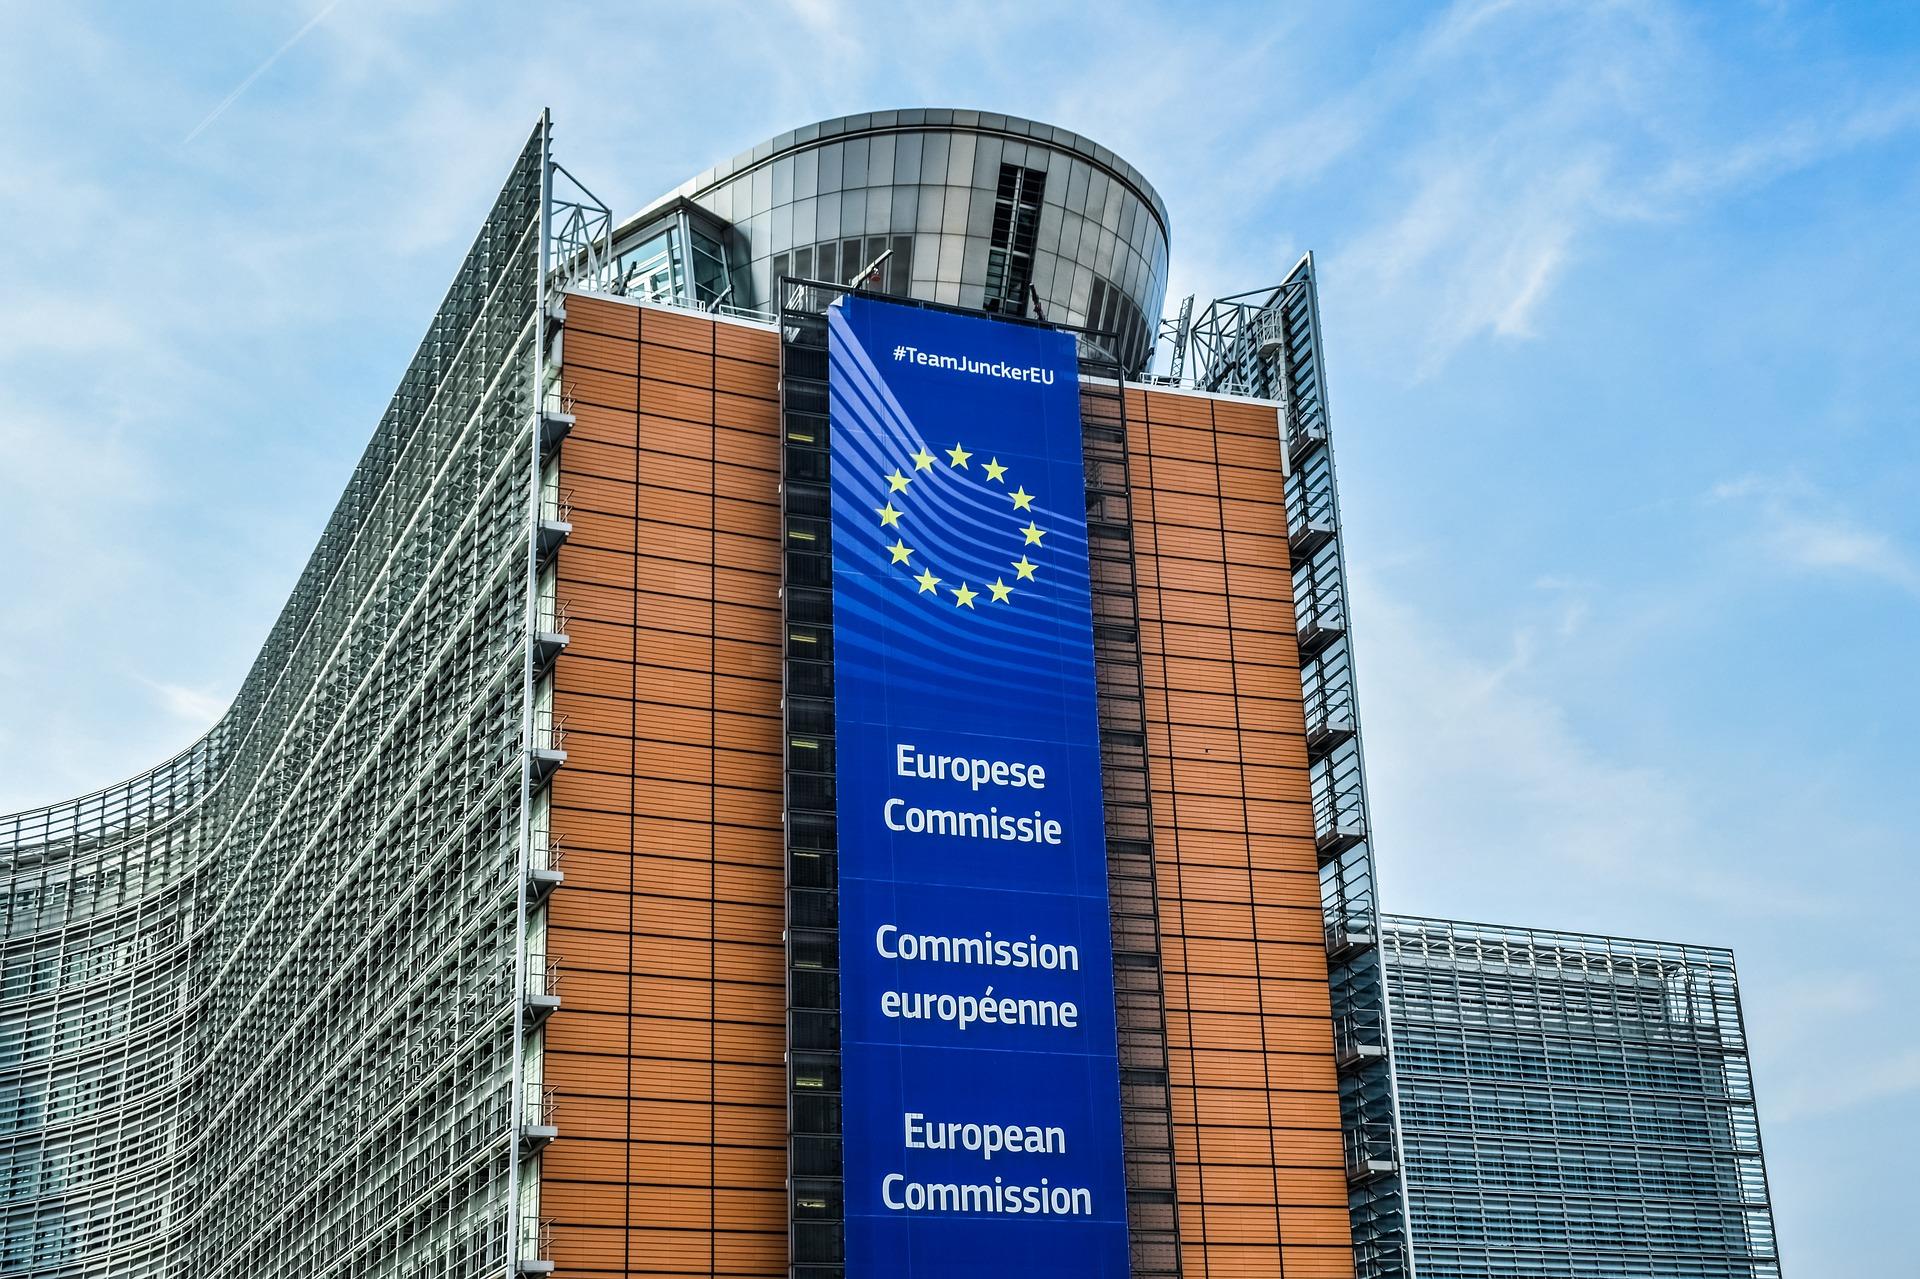 EU Funding – Response to Commission